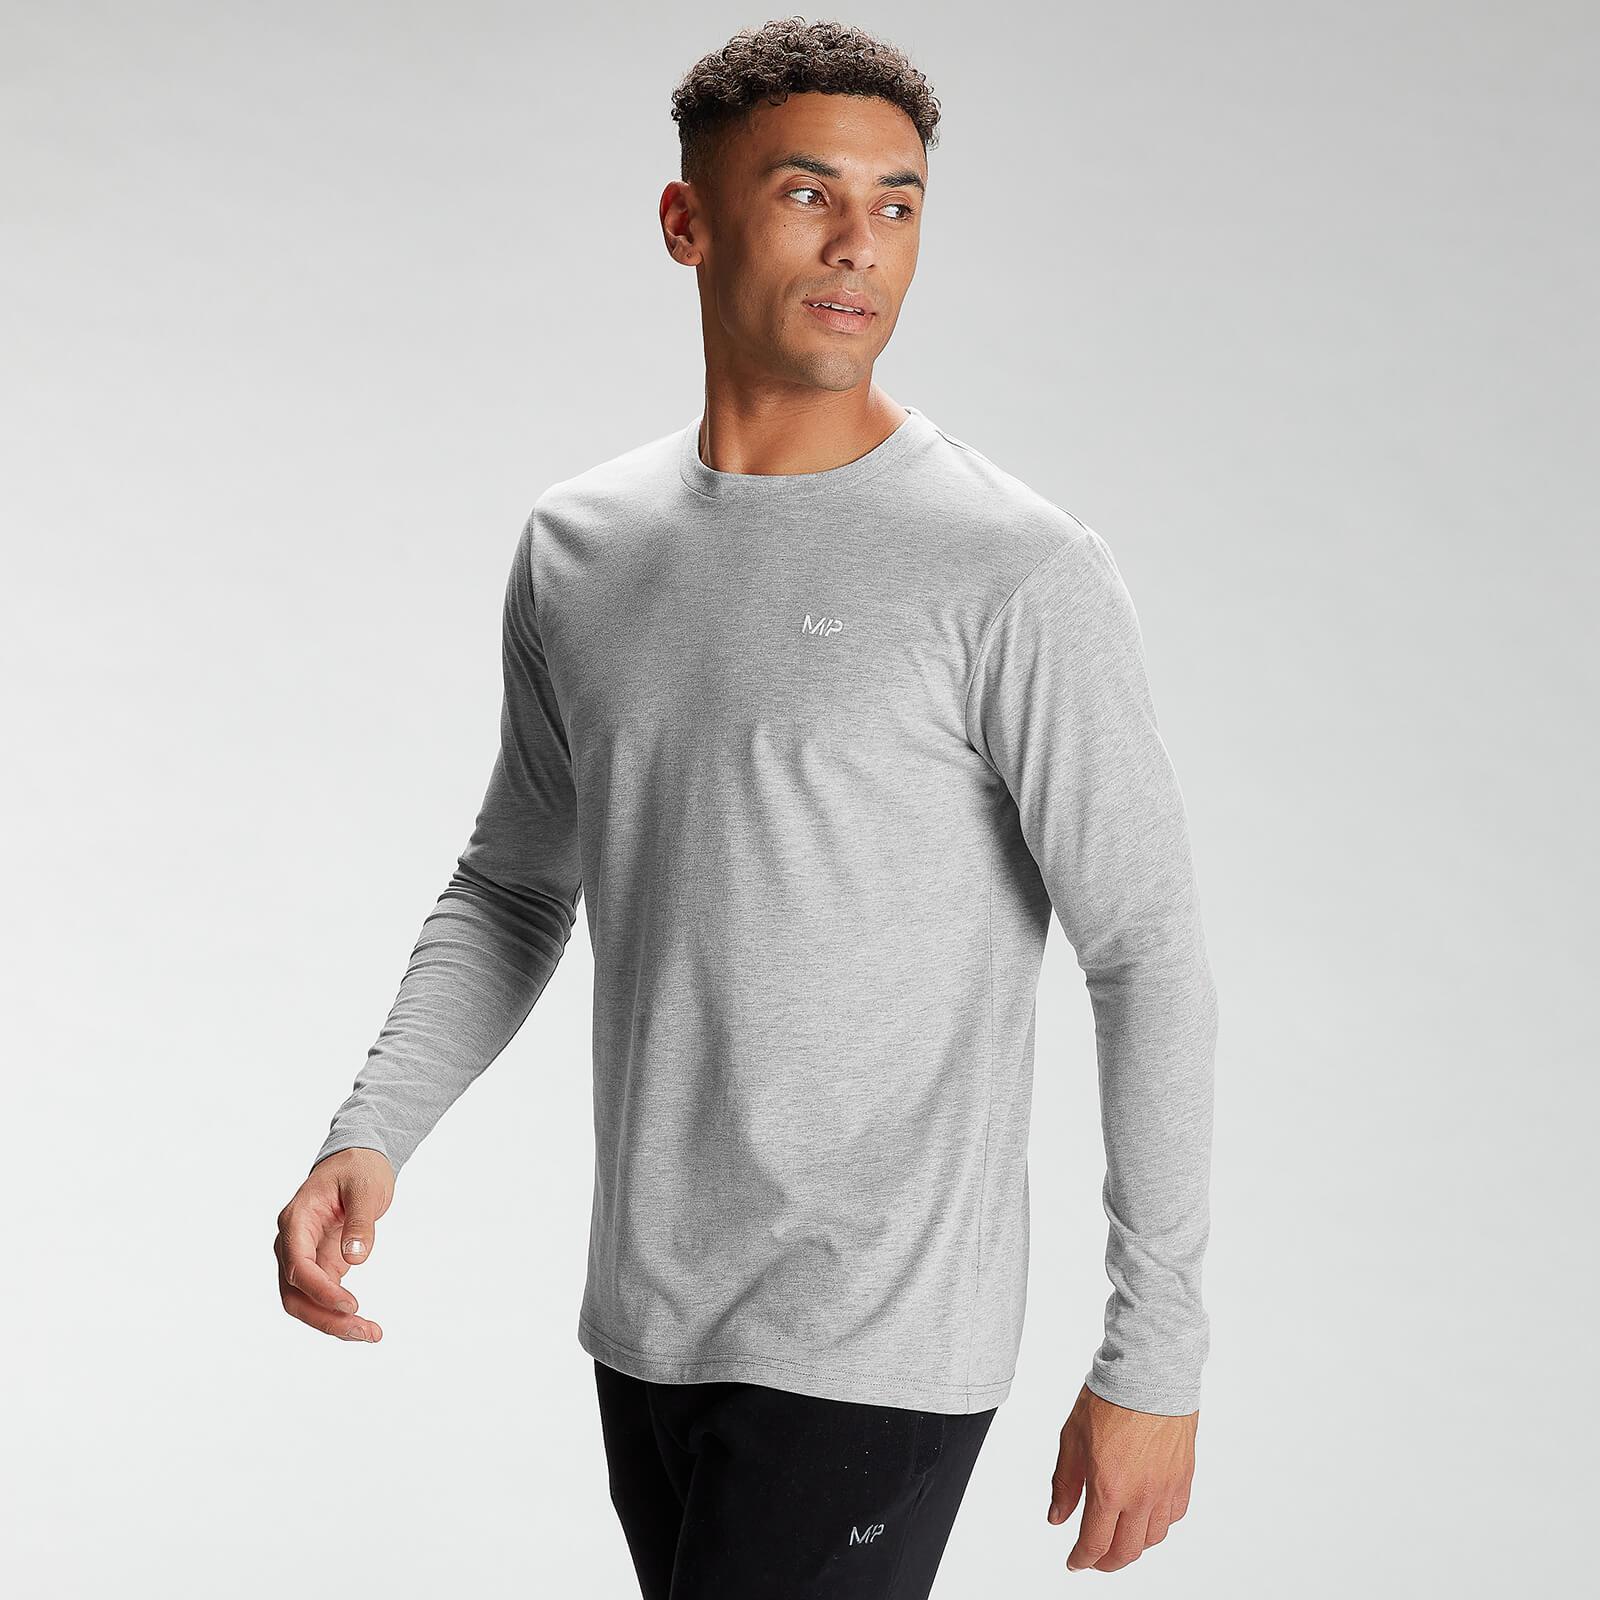 Купить MP Men's Essentials Long Sleeve Top - Grey Marl - XXL, Myprotein International